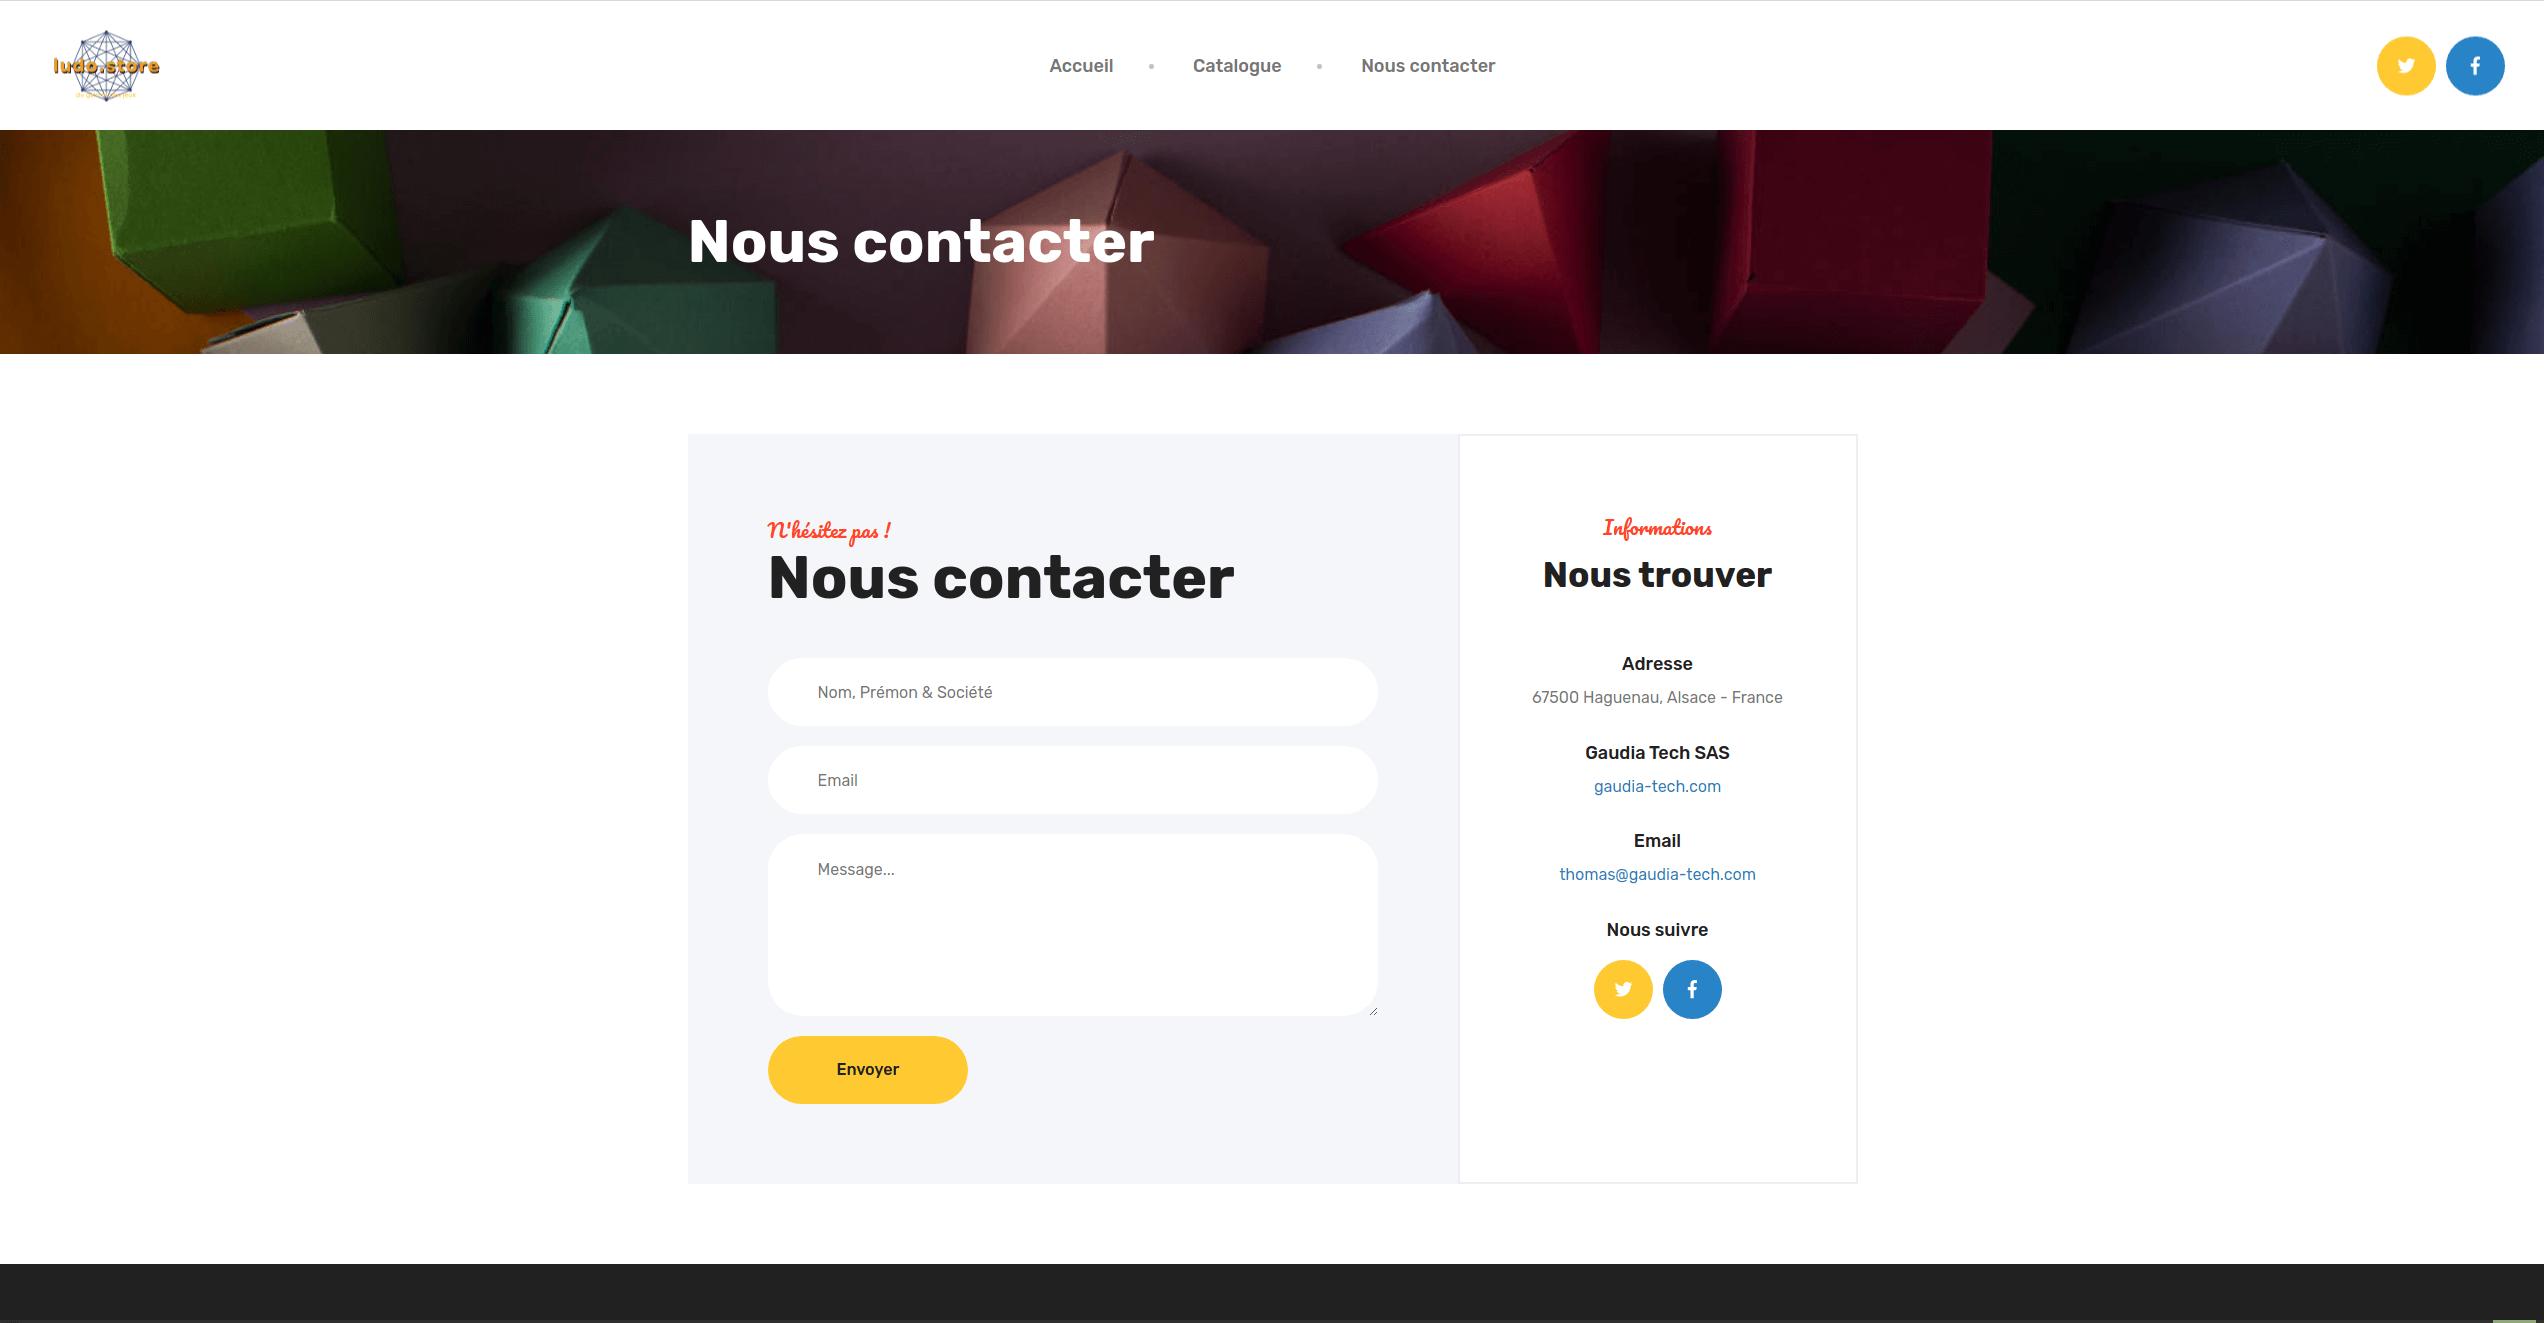 Gaudia Tech - Formulaire de contact